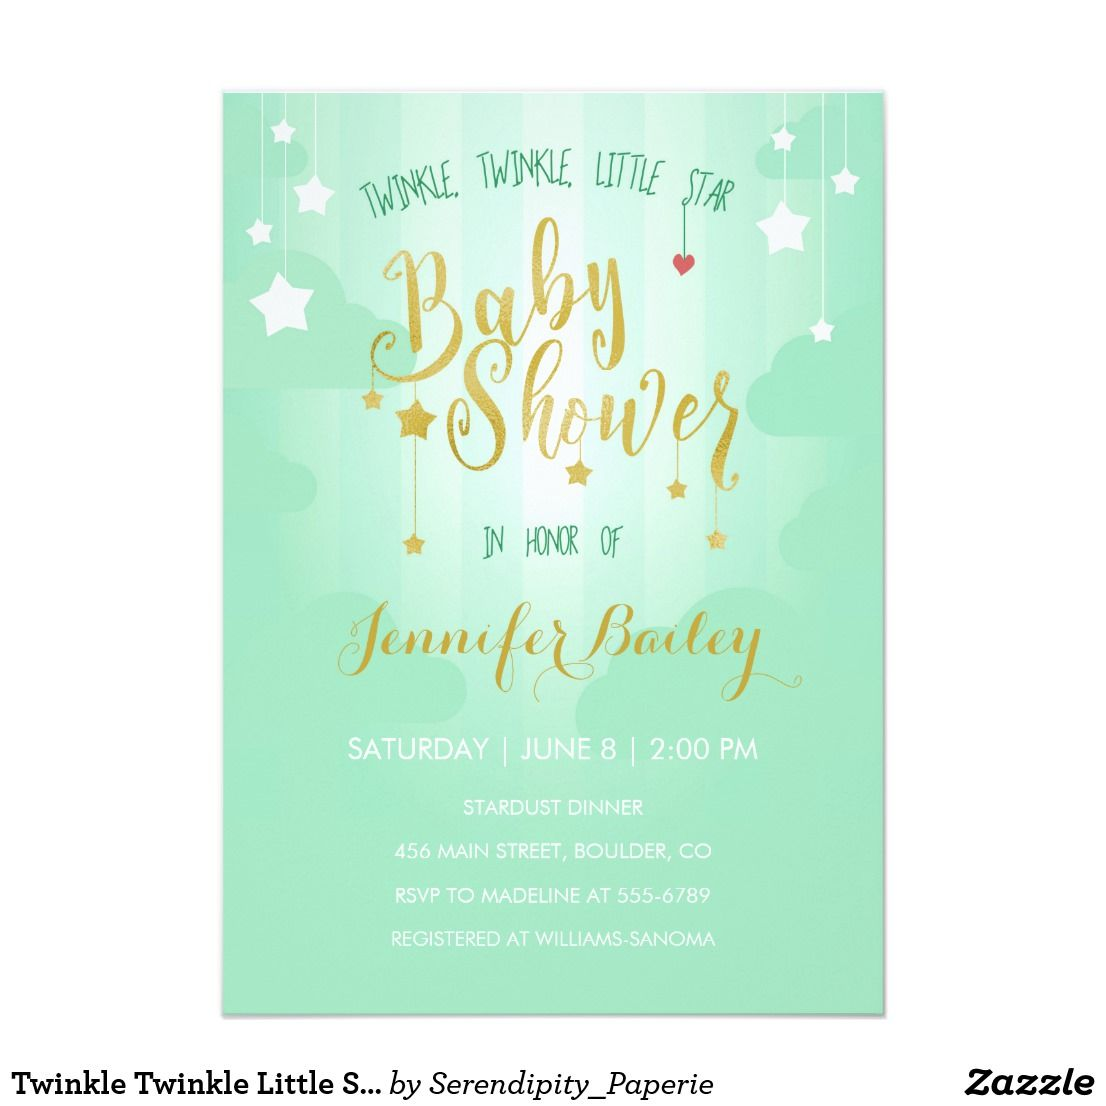 Twinkle Twinkle Little Star Baby Shower Invitation   Star baby ...